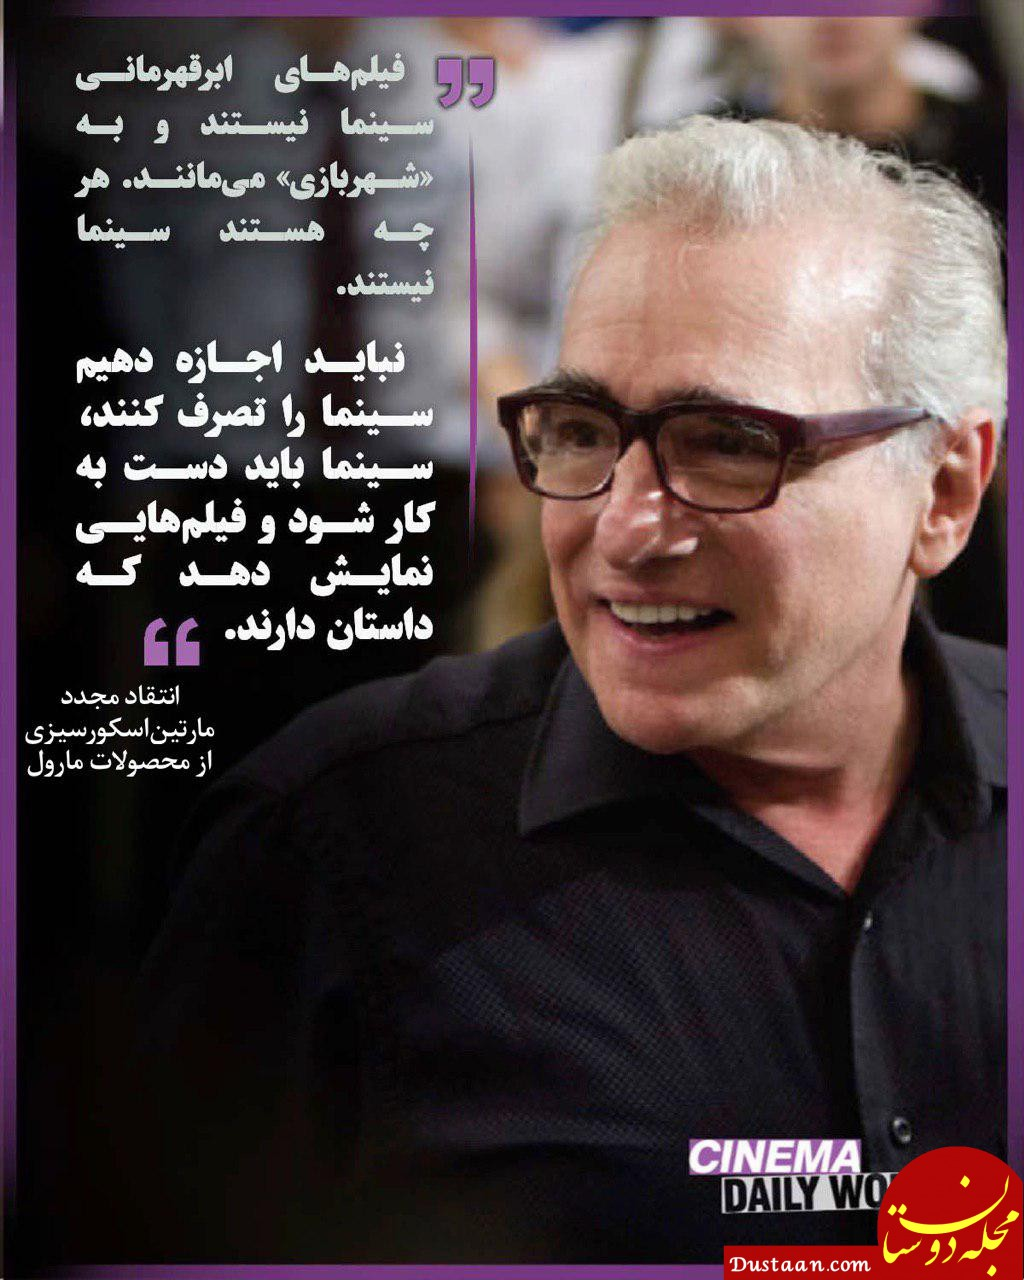 www.dustaan.com انتقاد مجدد اسکورسیزی از محصولات مارول: سینما نیستند، نباید هم بگذاریم سینما را تصرف کنند